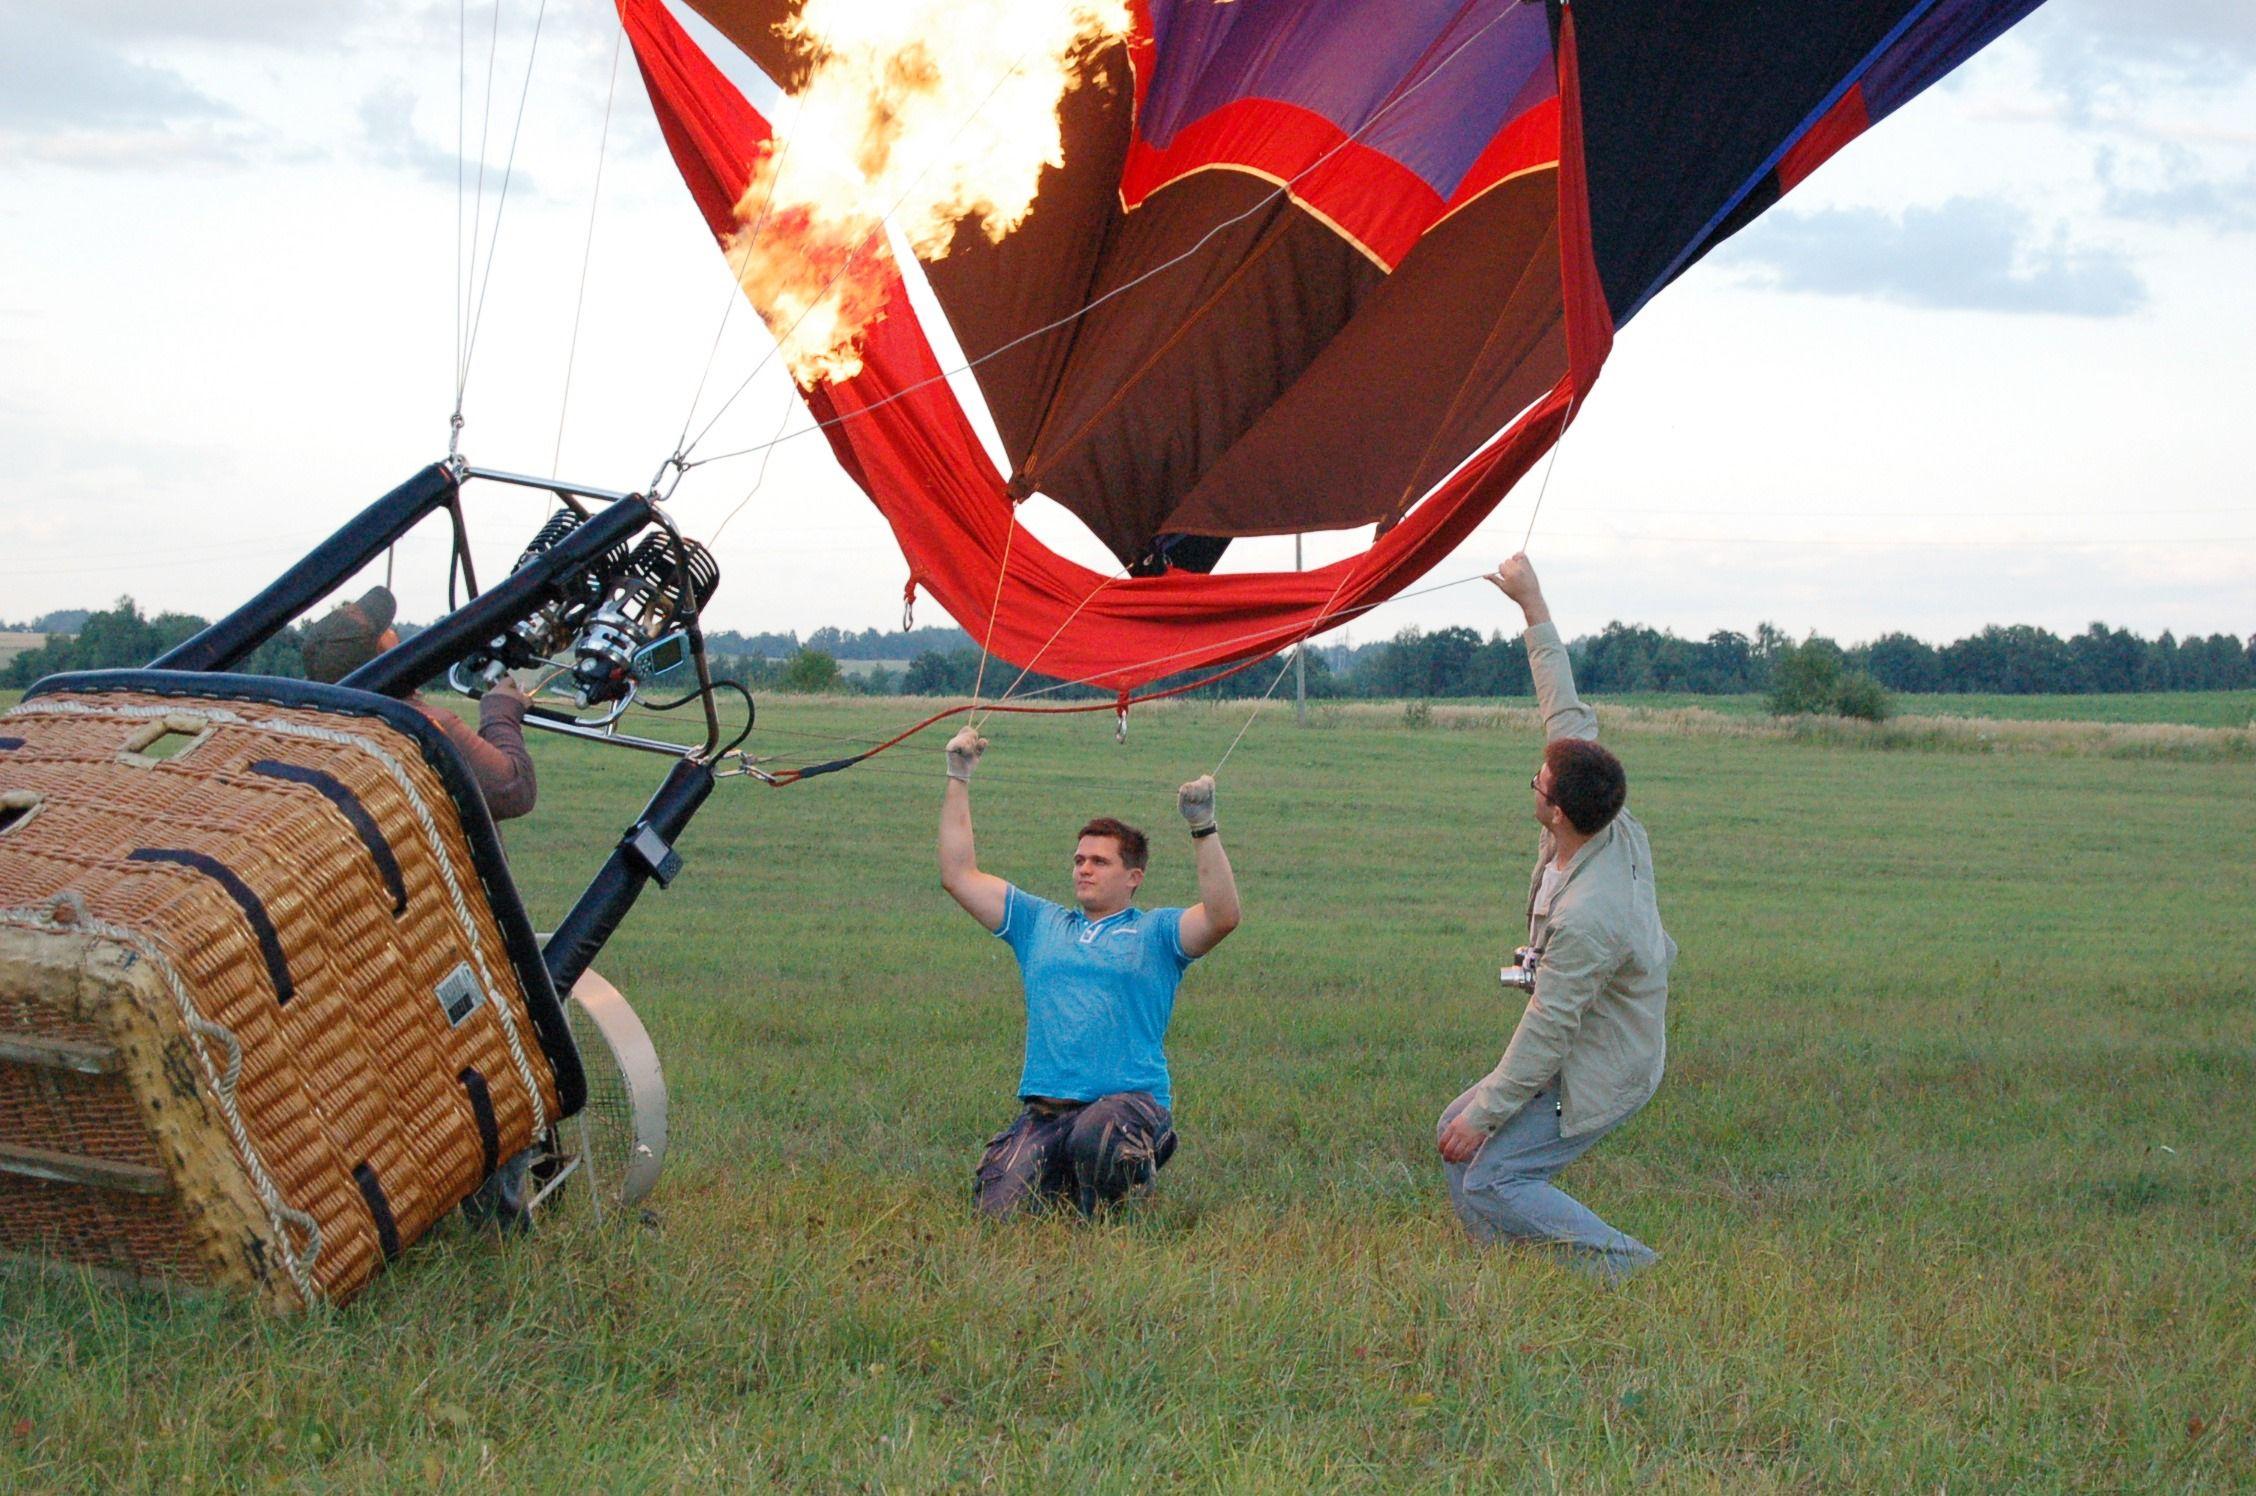 Мастер-класс «Я пилот воздушного шара» фото 2